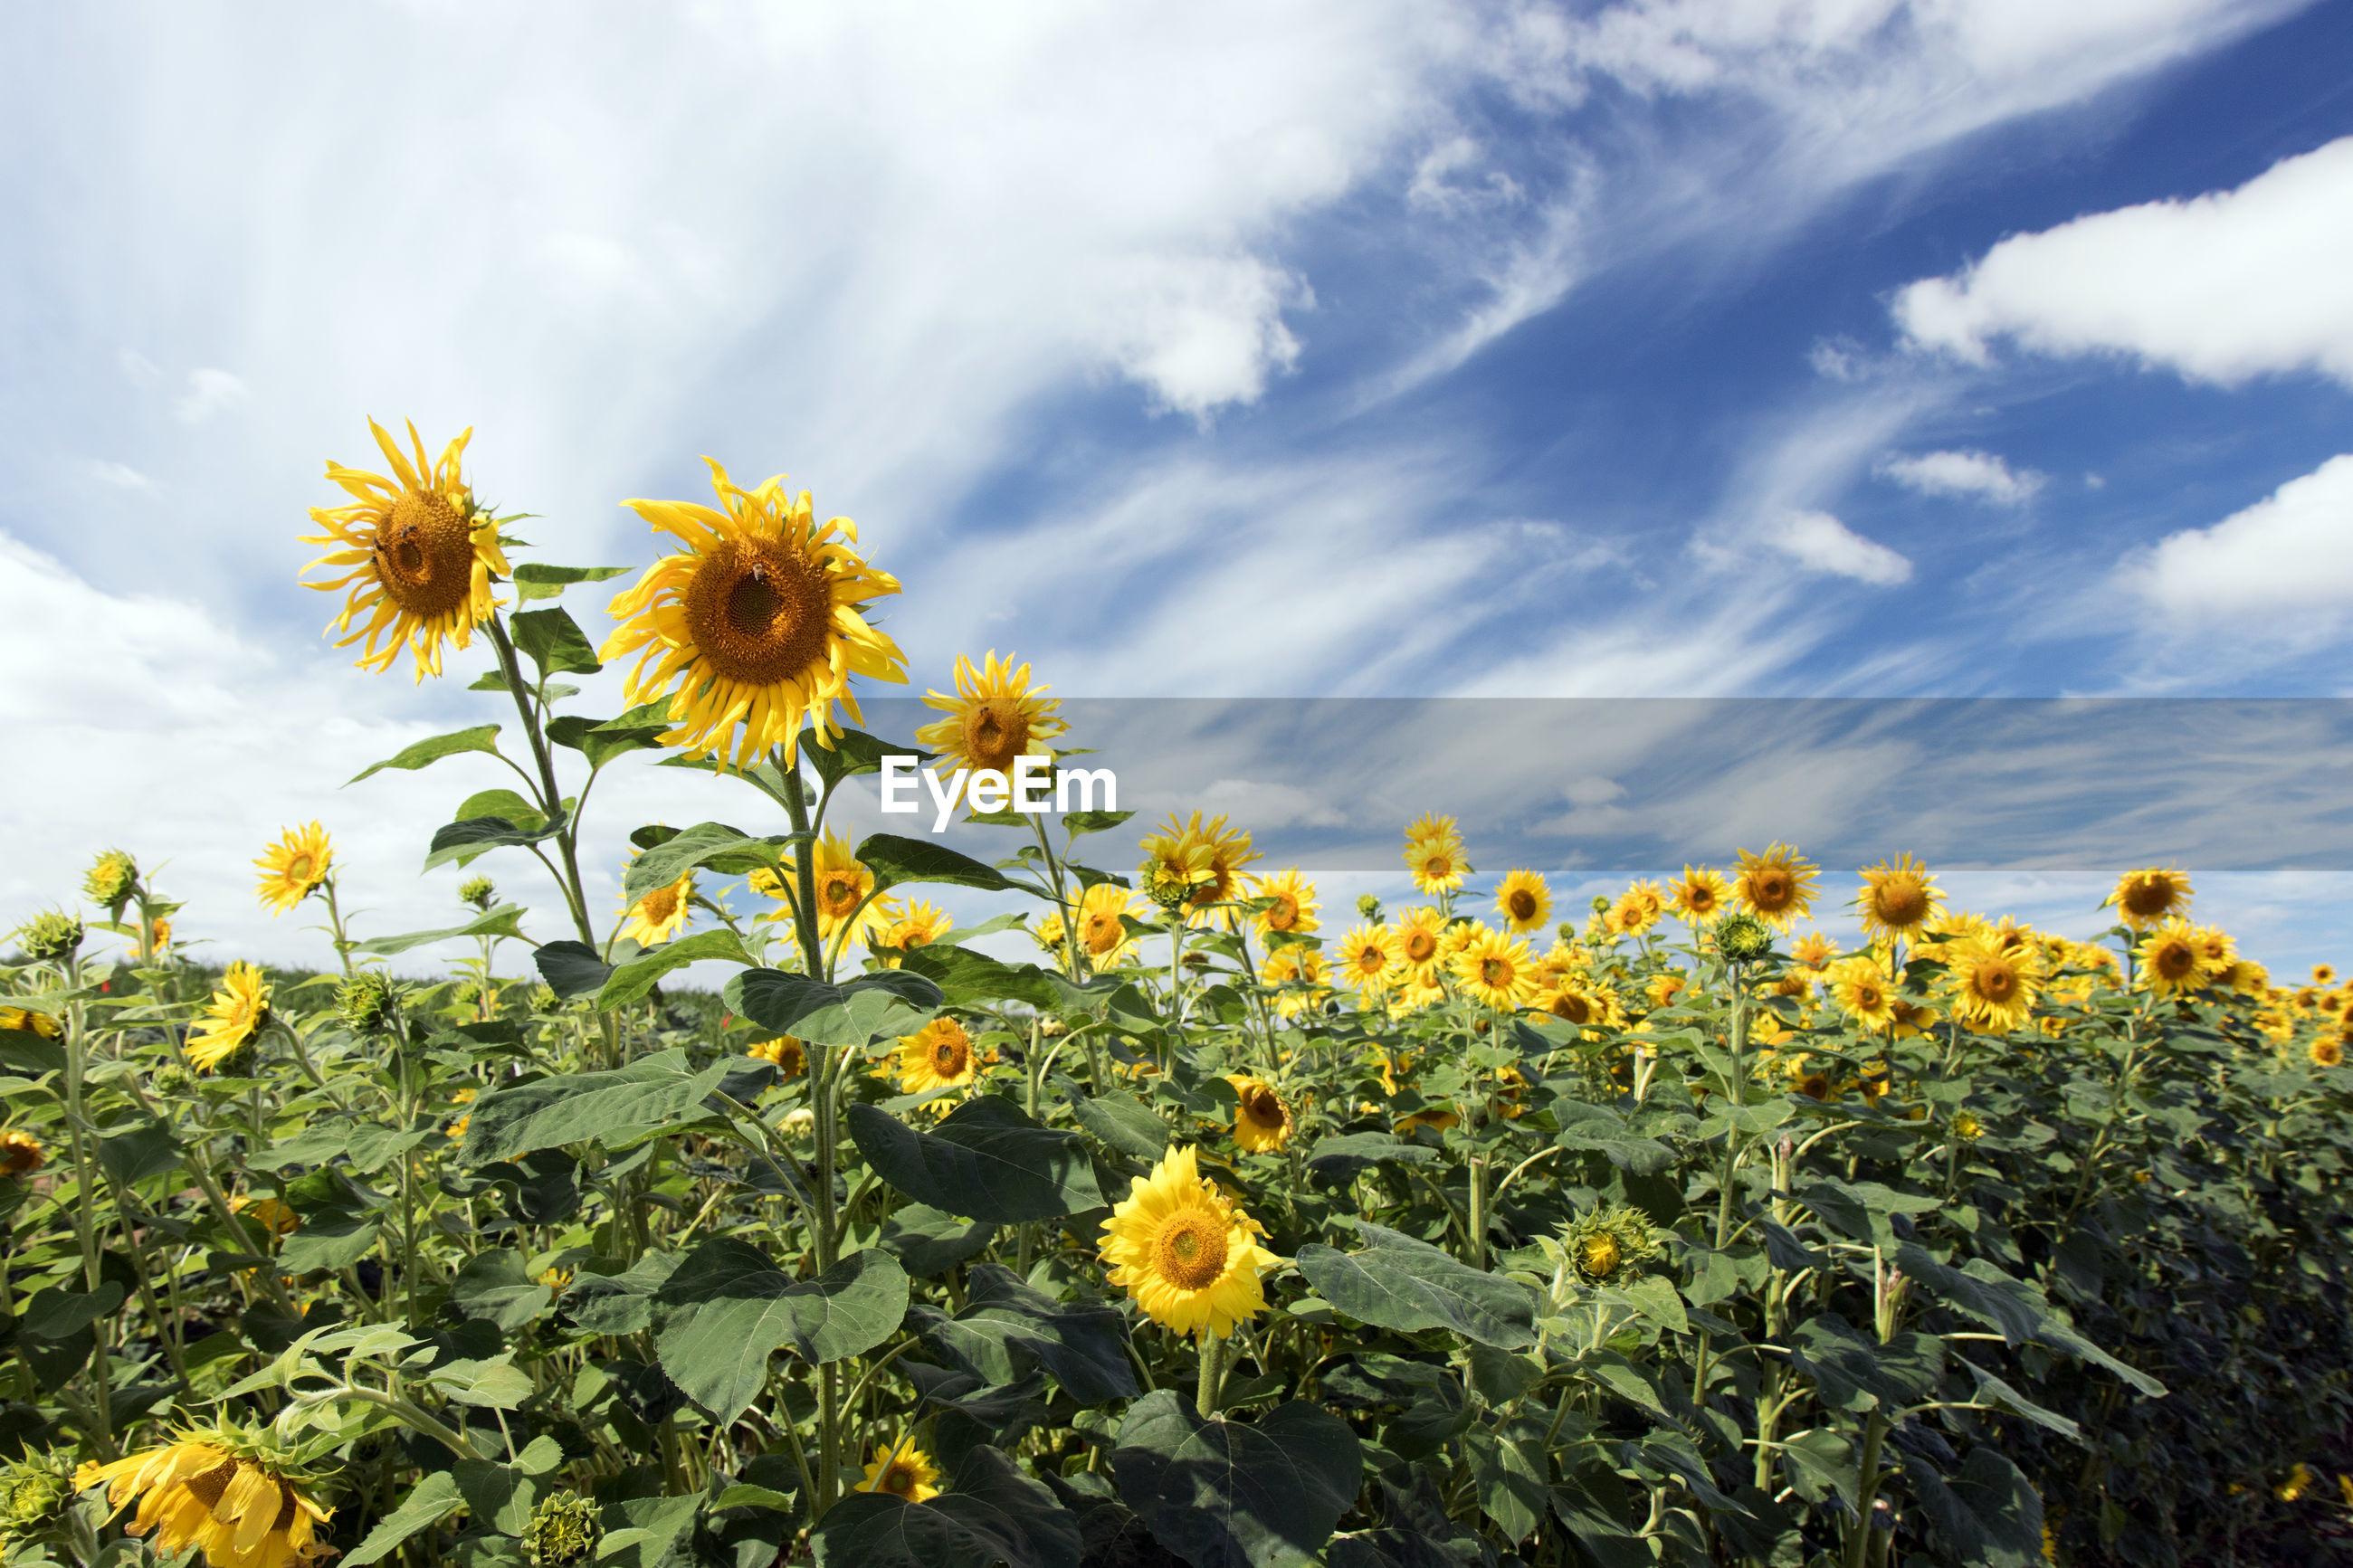 CLOSE-UP OF YELLOW SUNFLOWER FIELD